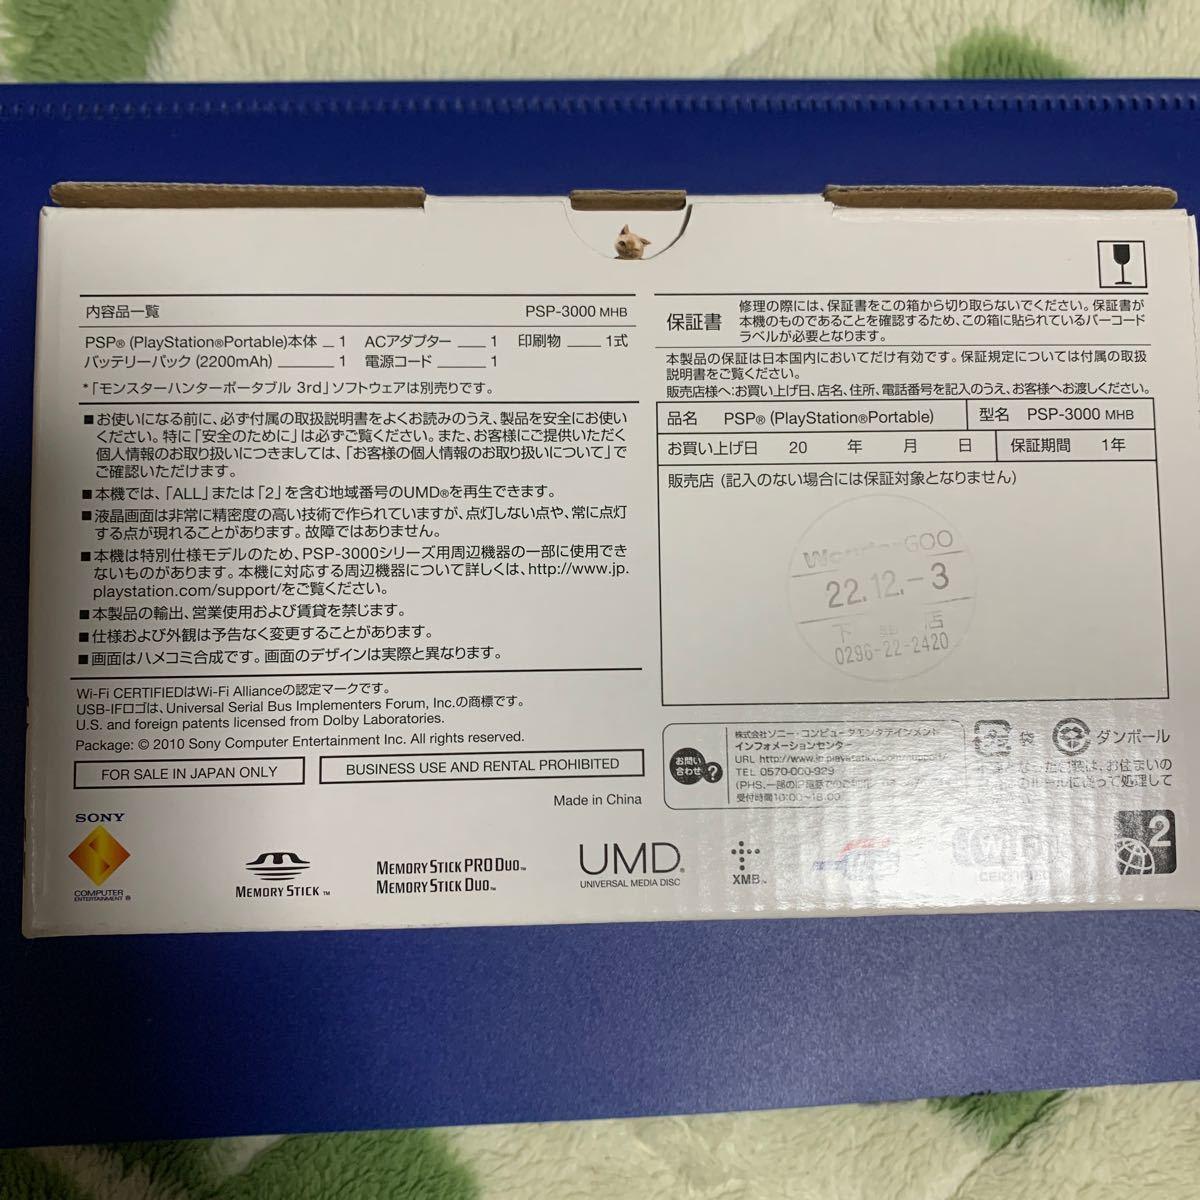 PSP プレイステーション・ポータブル (PSP-3000) モンスターハンターポータブル 3rd ハンターズモデル